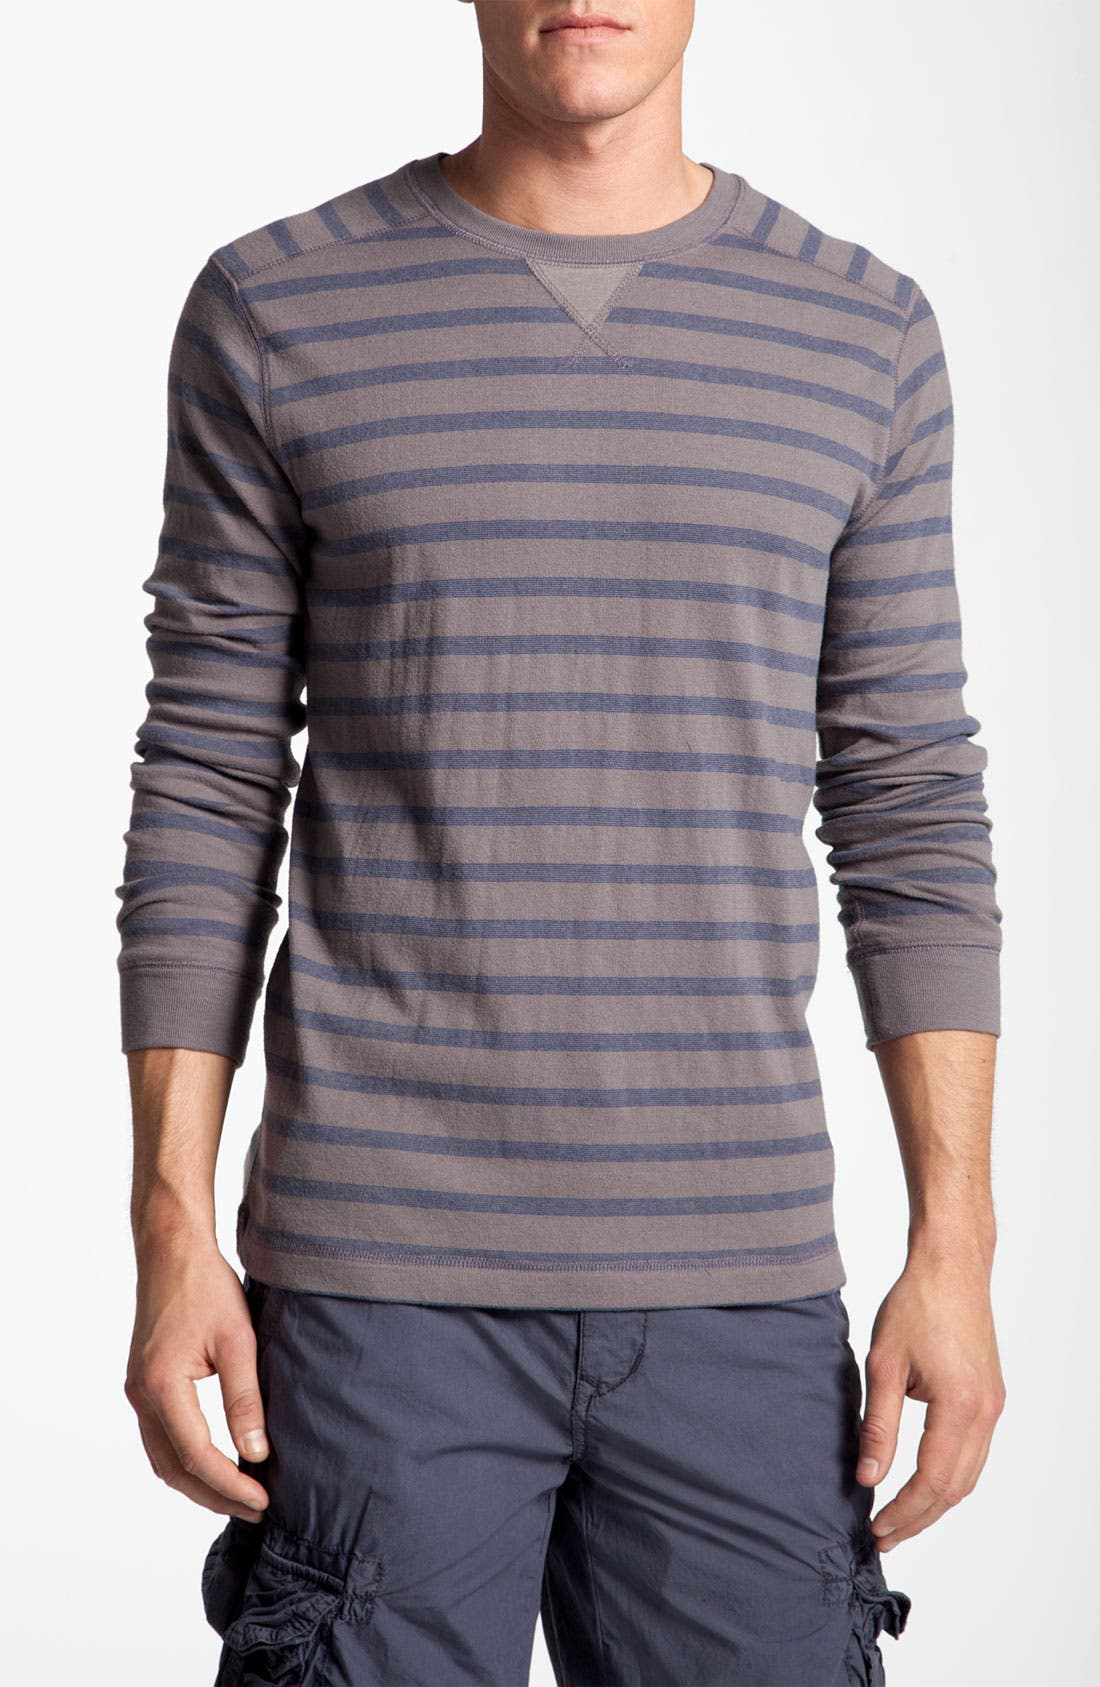 Alternate Image 1 Selected - Quiksilver Knit Crewneck T-Shirt